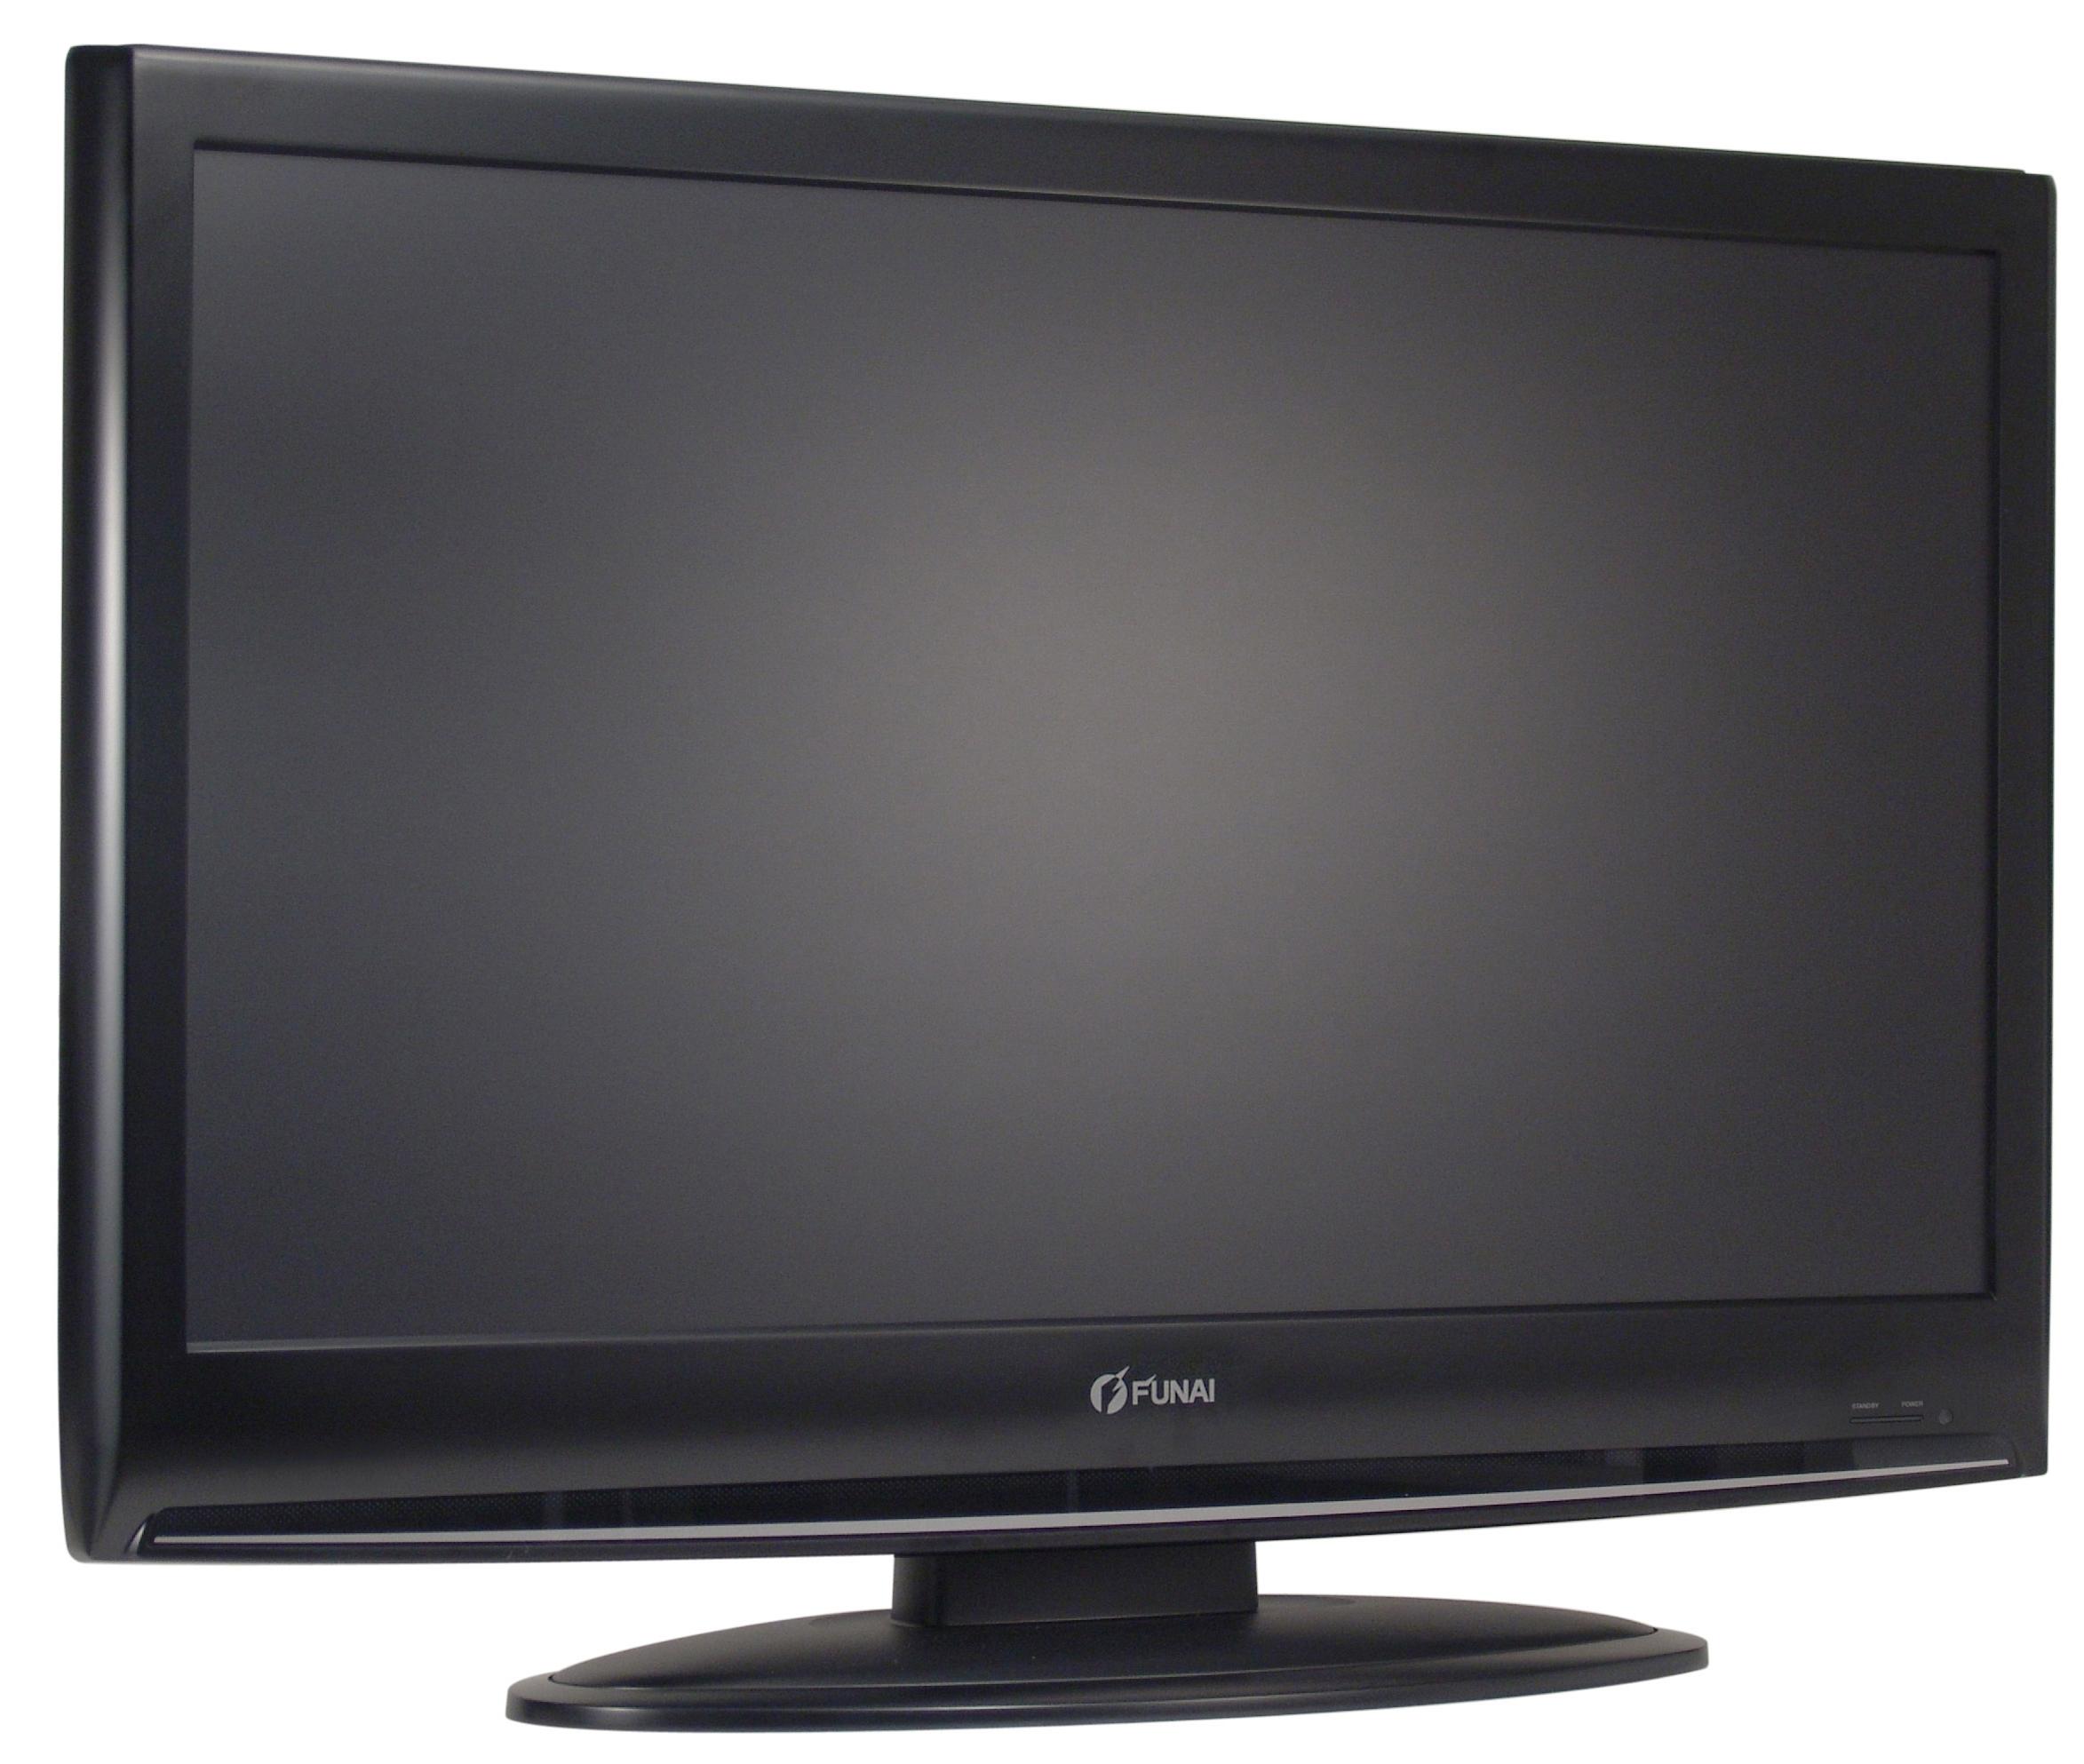 Funai LT-6M32BB 81,3 cm (32 Zoll) 16:9 HD-Ready LCD